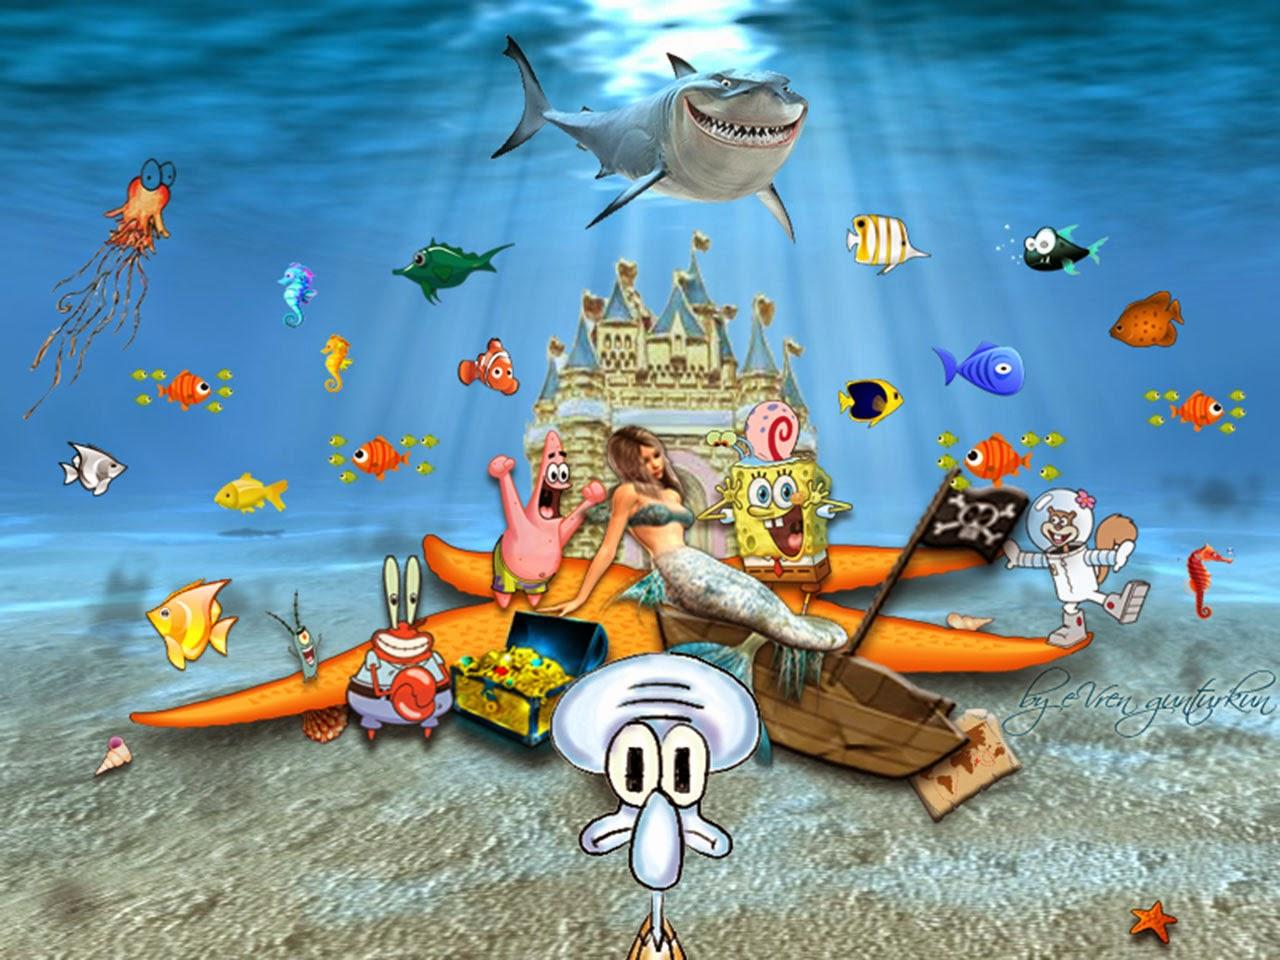 spongebob squarepants and friends 3d wallpaper - spongebob friend